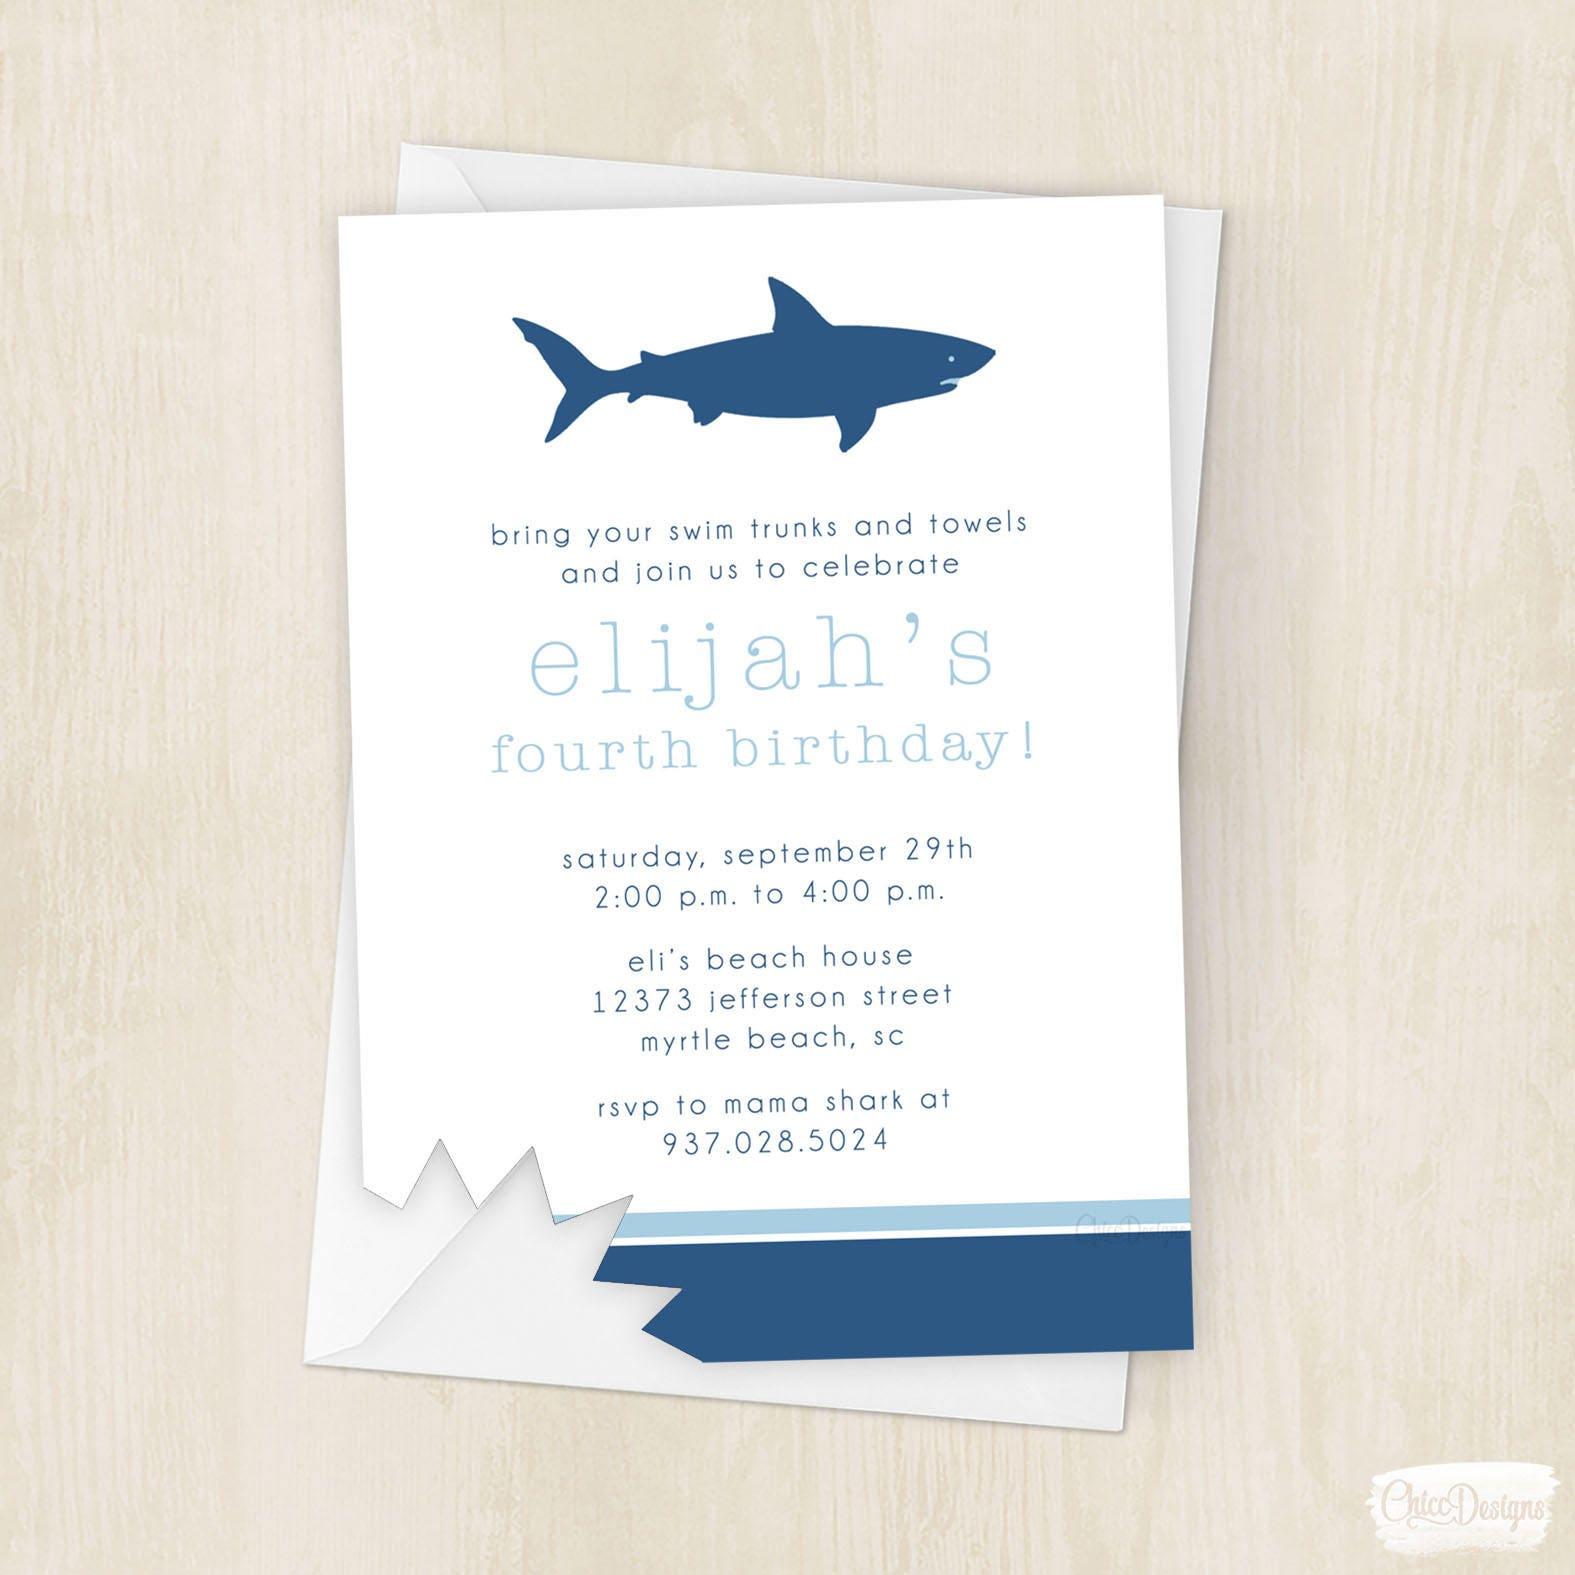 Shark Attack Birthday Invite Mega Shark Megalodon Bite | Etsy